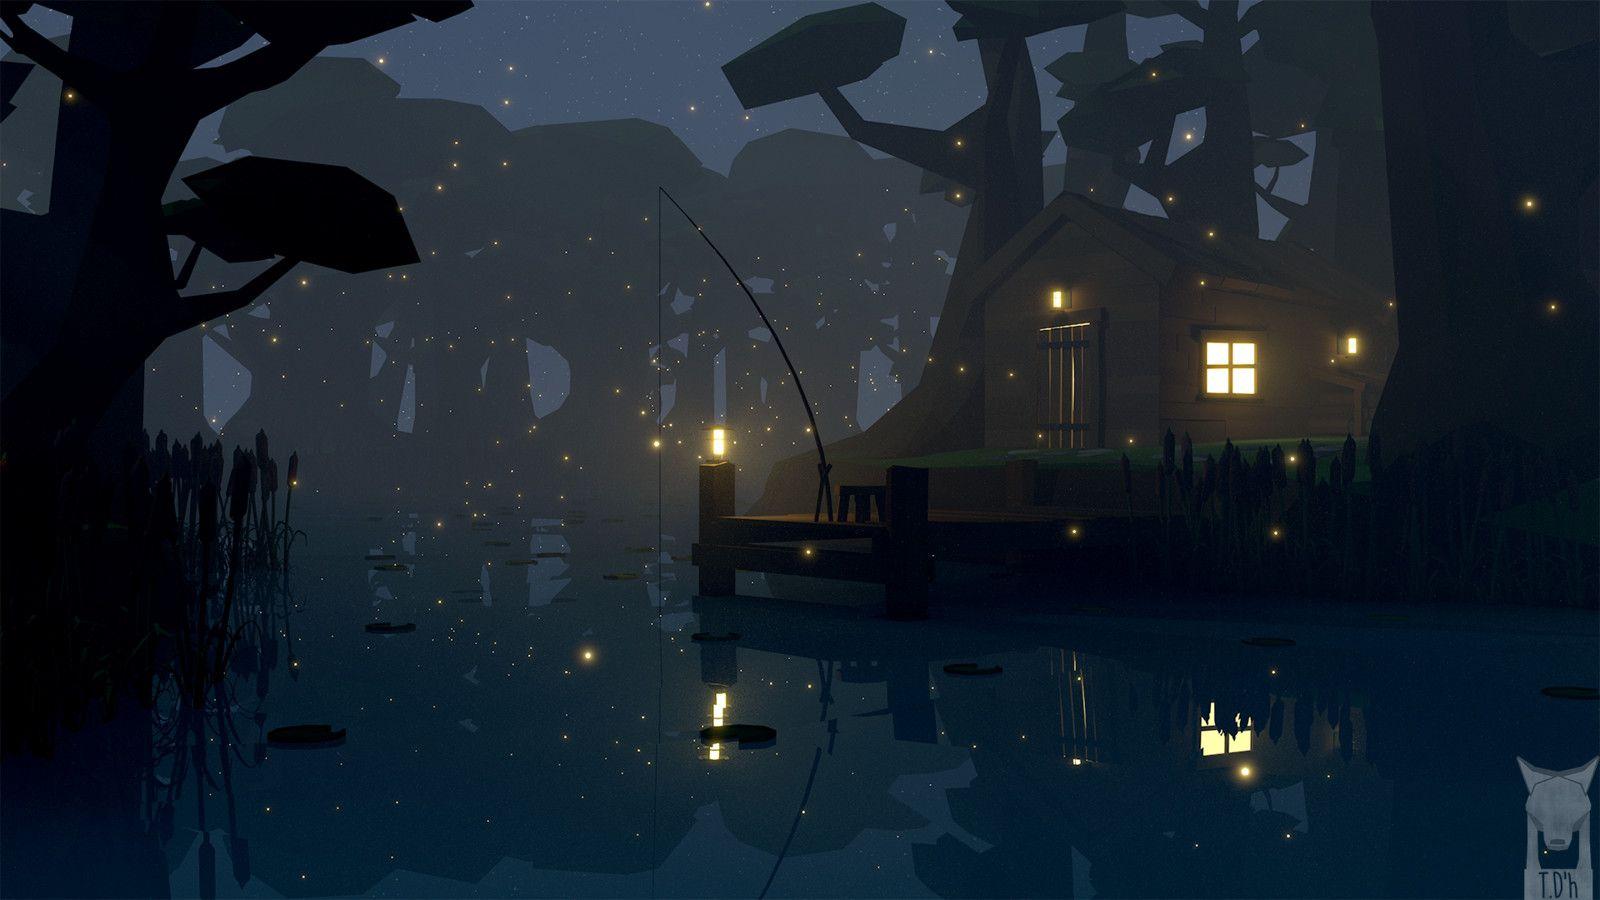 low poly - swamp fishing, Tim D'hoore on ArtStation at https://www.artstation.com/artwork/Z0Wz0